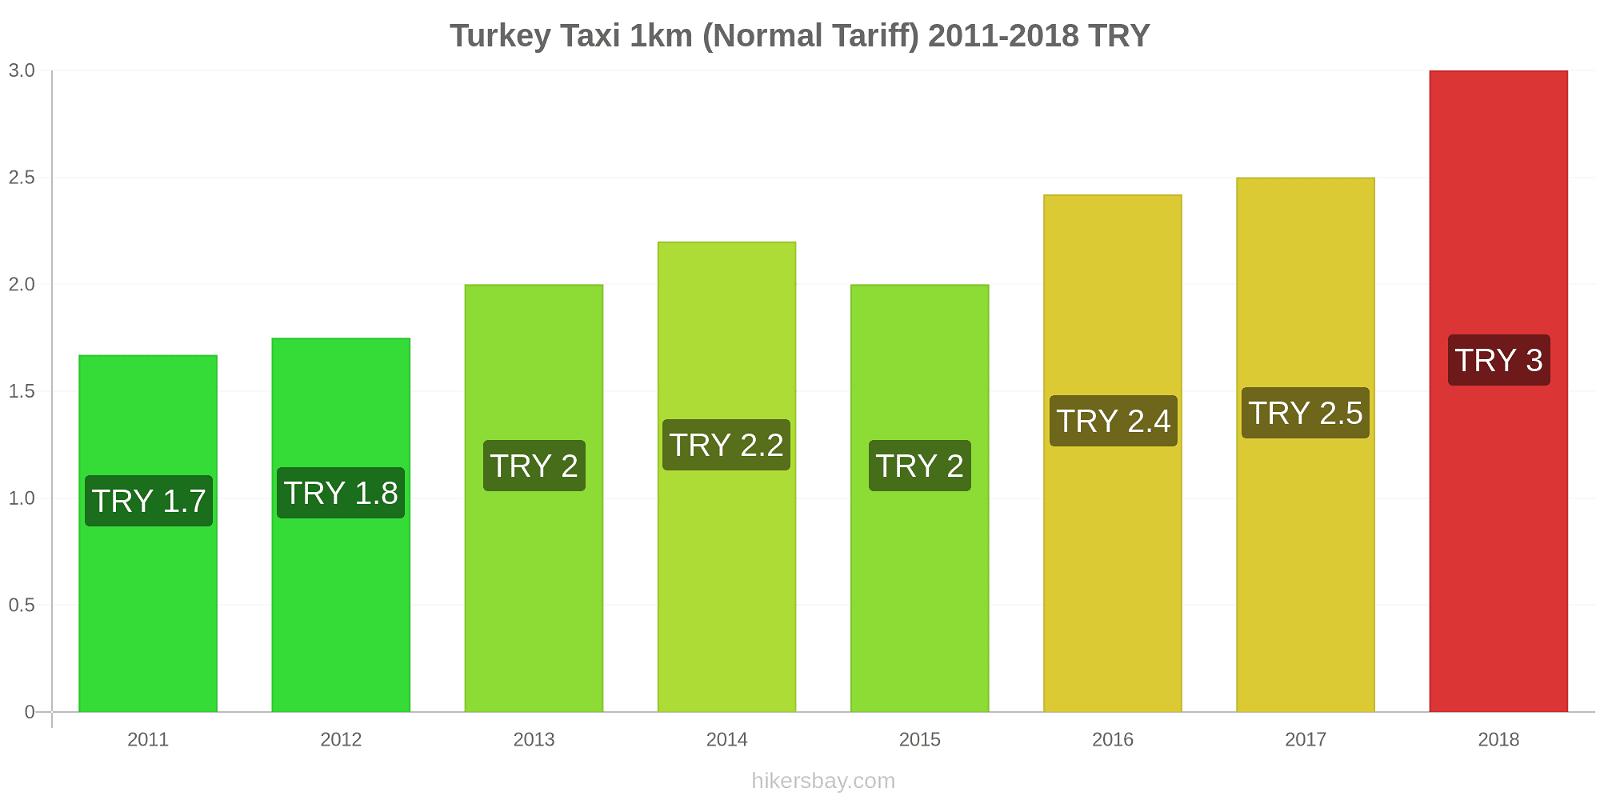 Turkey price changes Taxi 1km (Normal Tariff) hikersbay.com